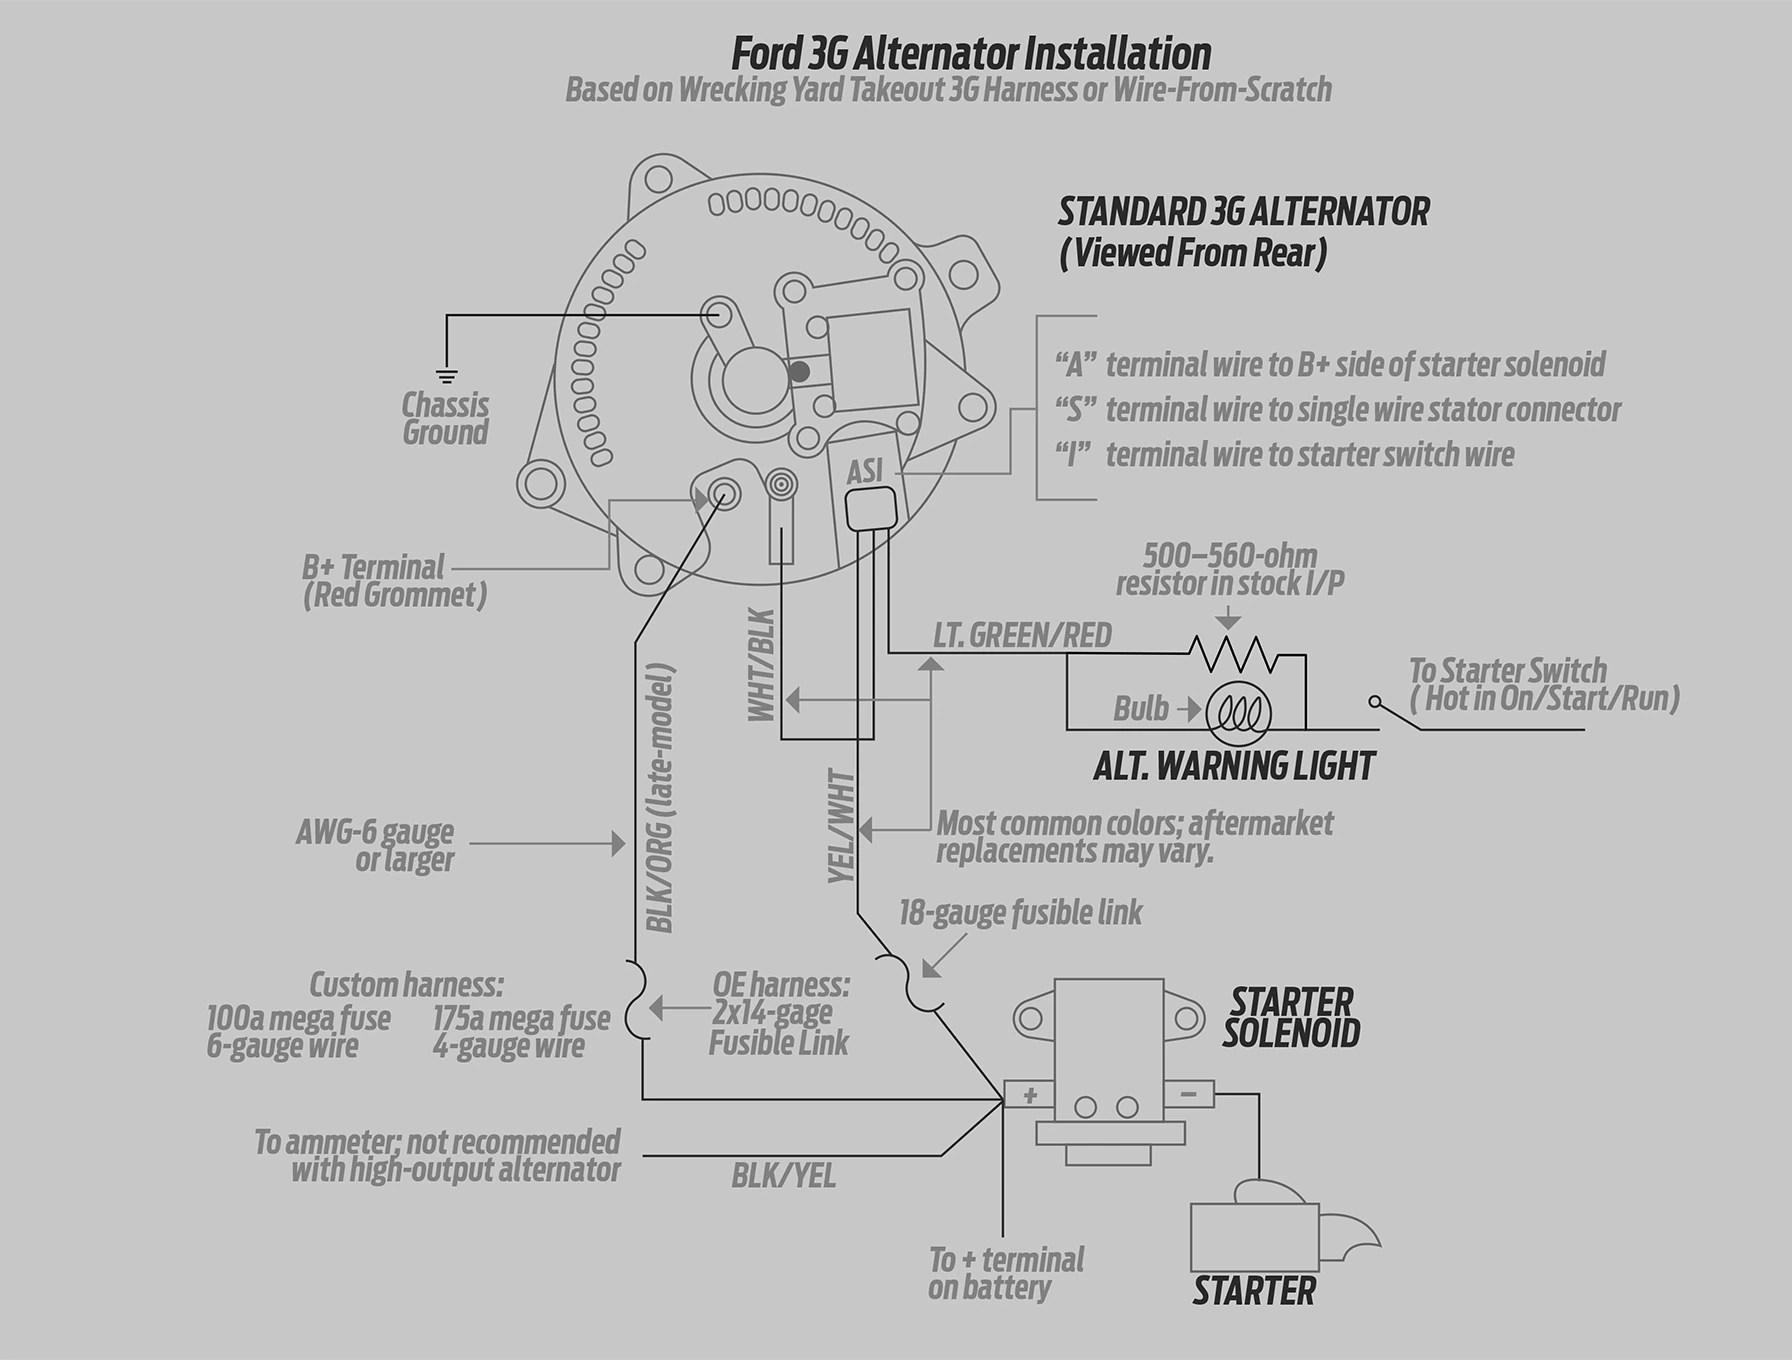 ford 3g alternator wiring harness wiring diagram toolboxford 3g alternator wiring wiring diagram details ford 3g [ 1792 x 1360 Pixel ]